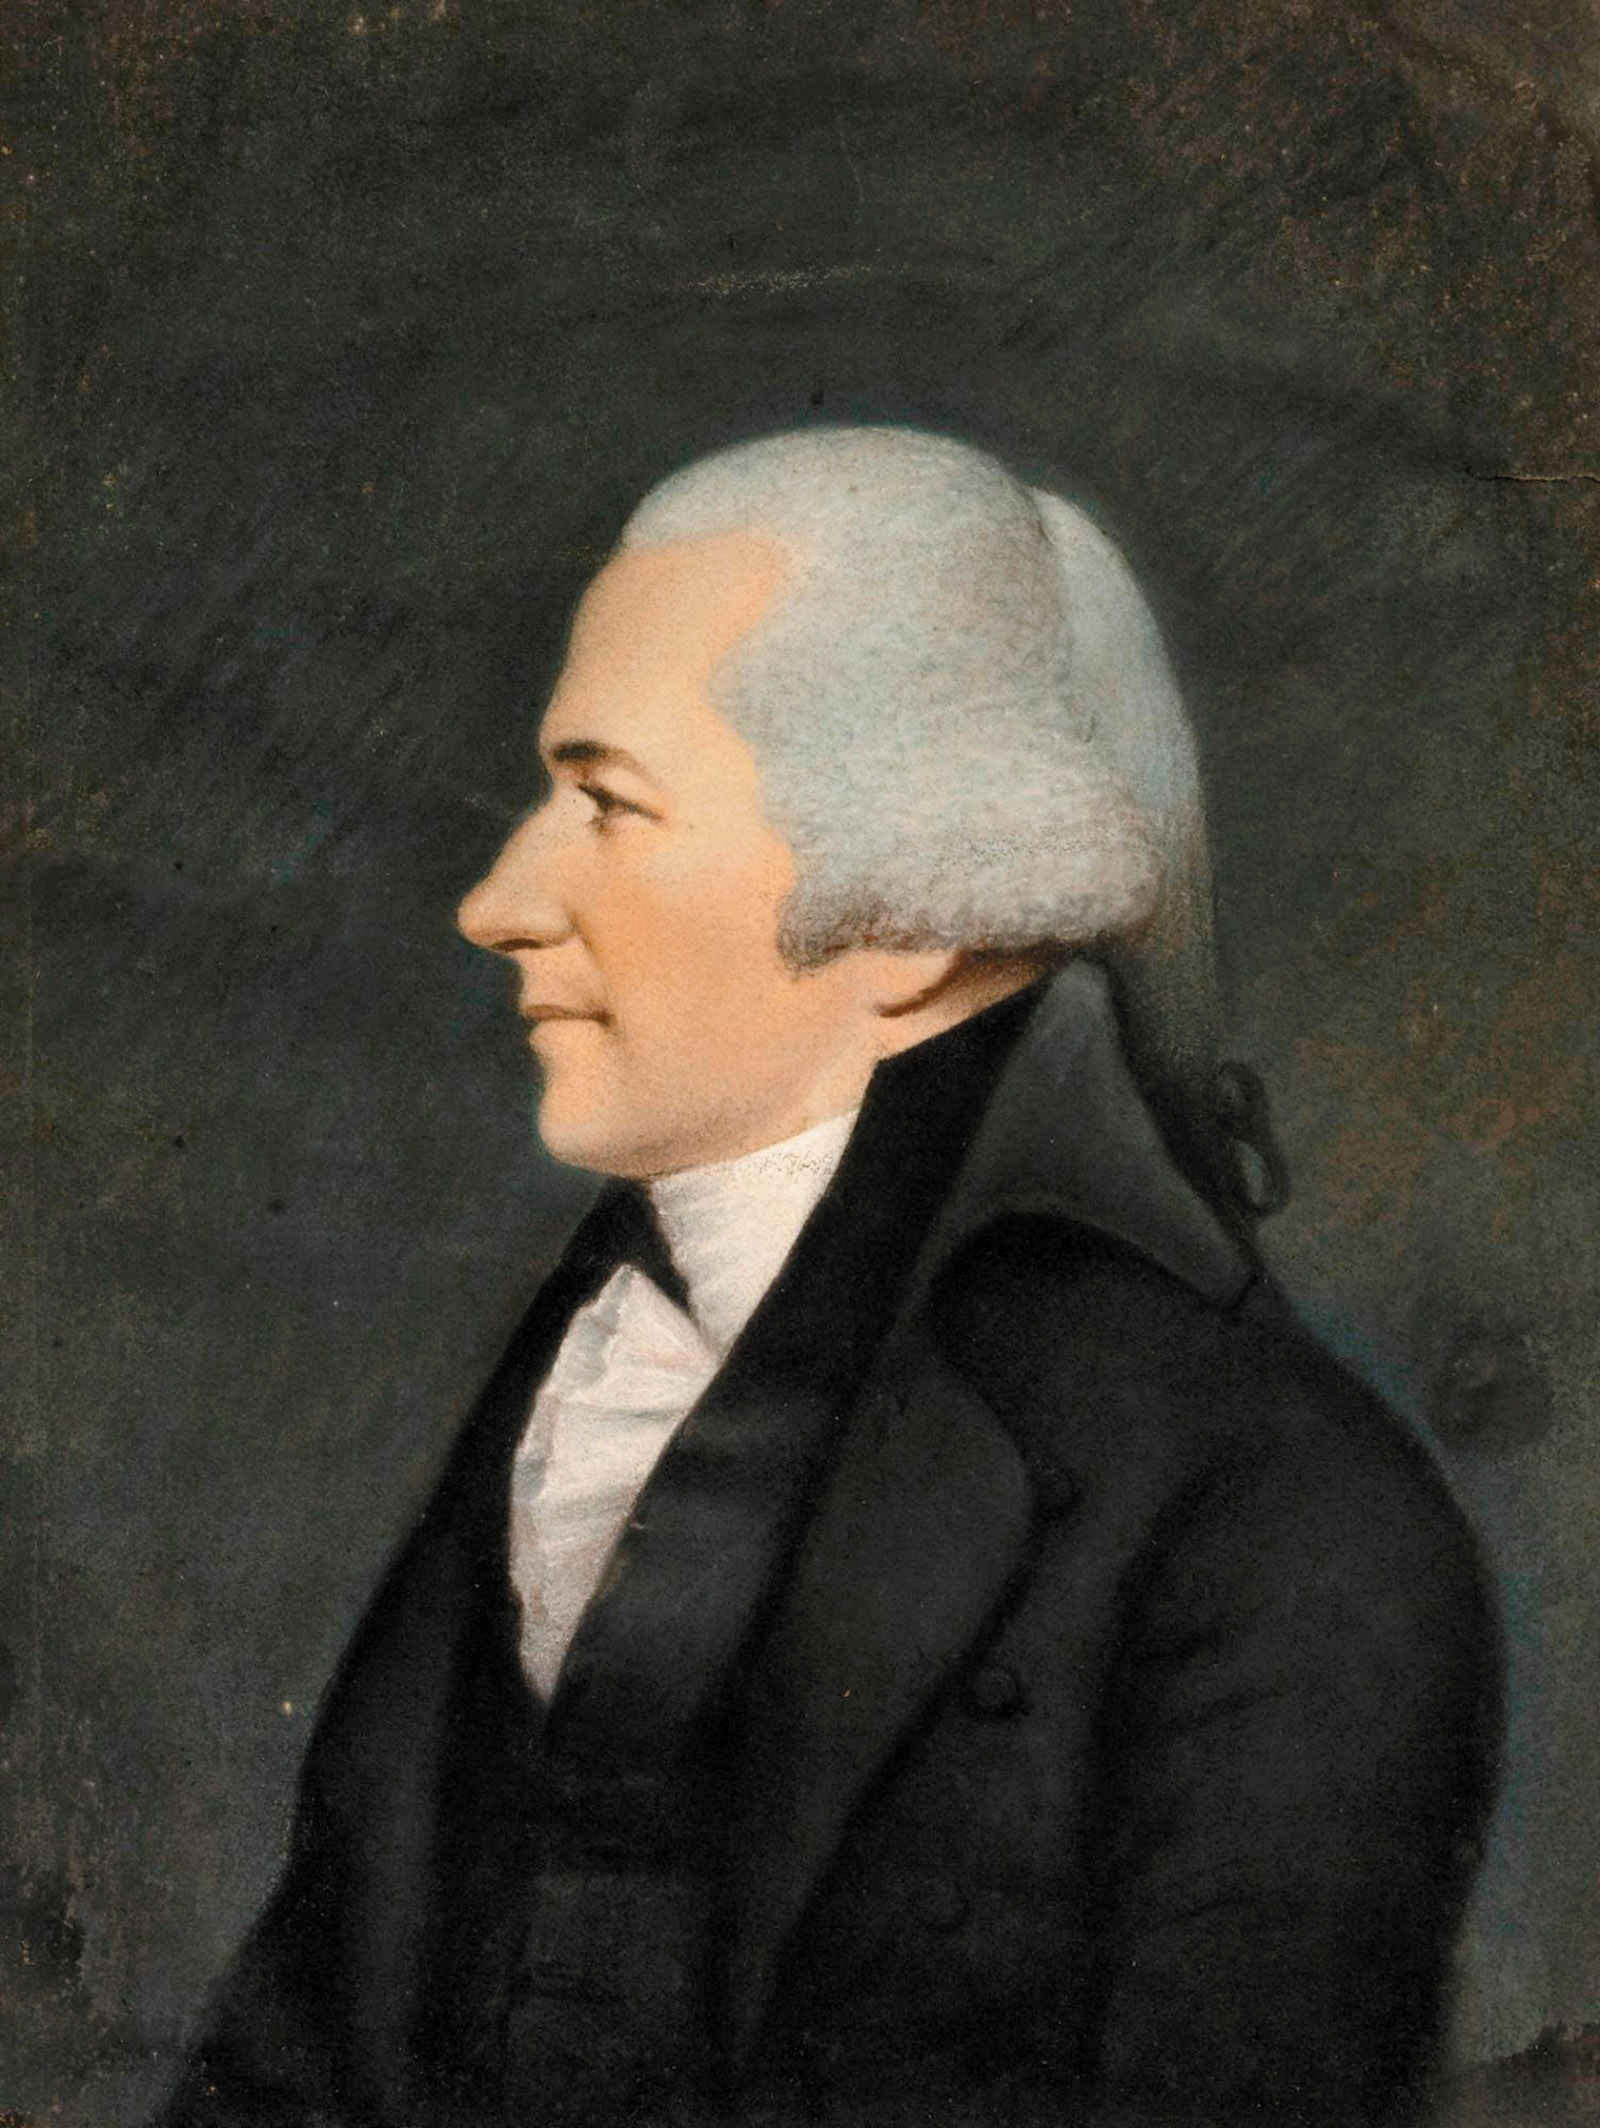 Alexander Hamilton; portrait by James Sharples, circa 1796